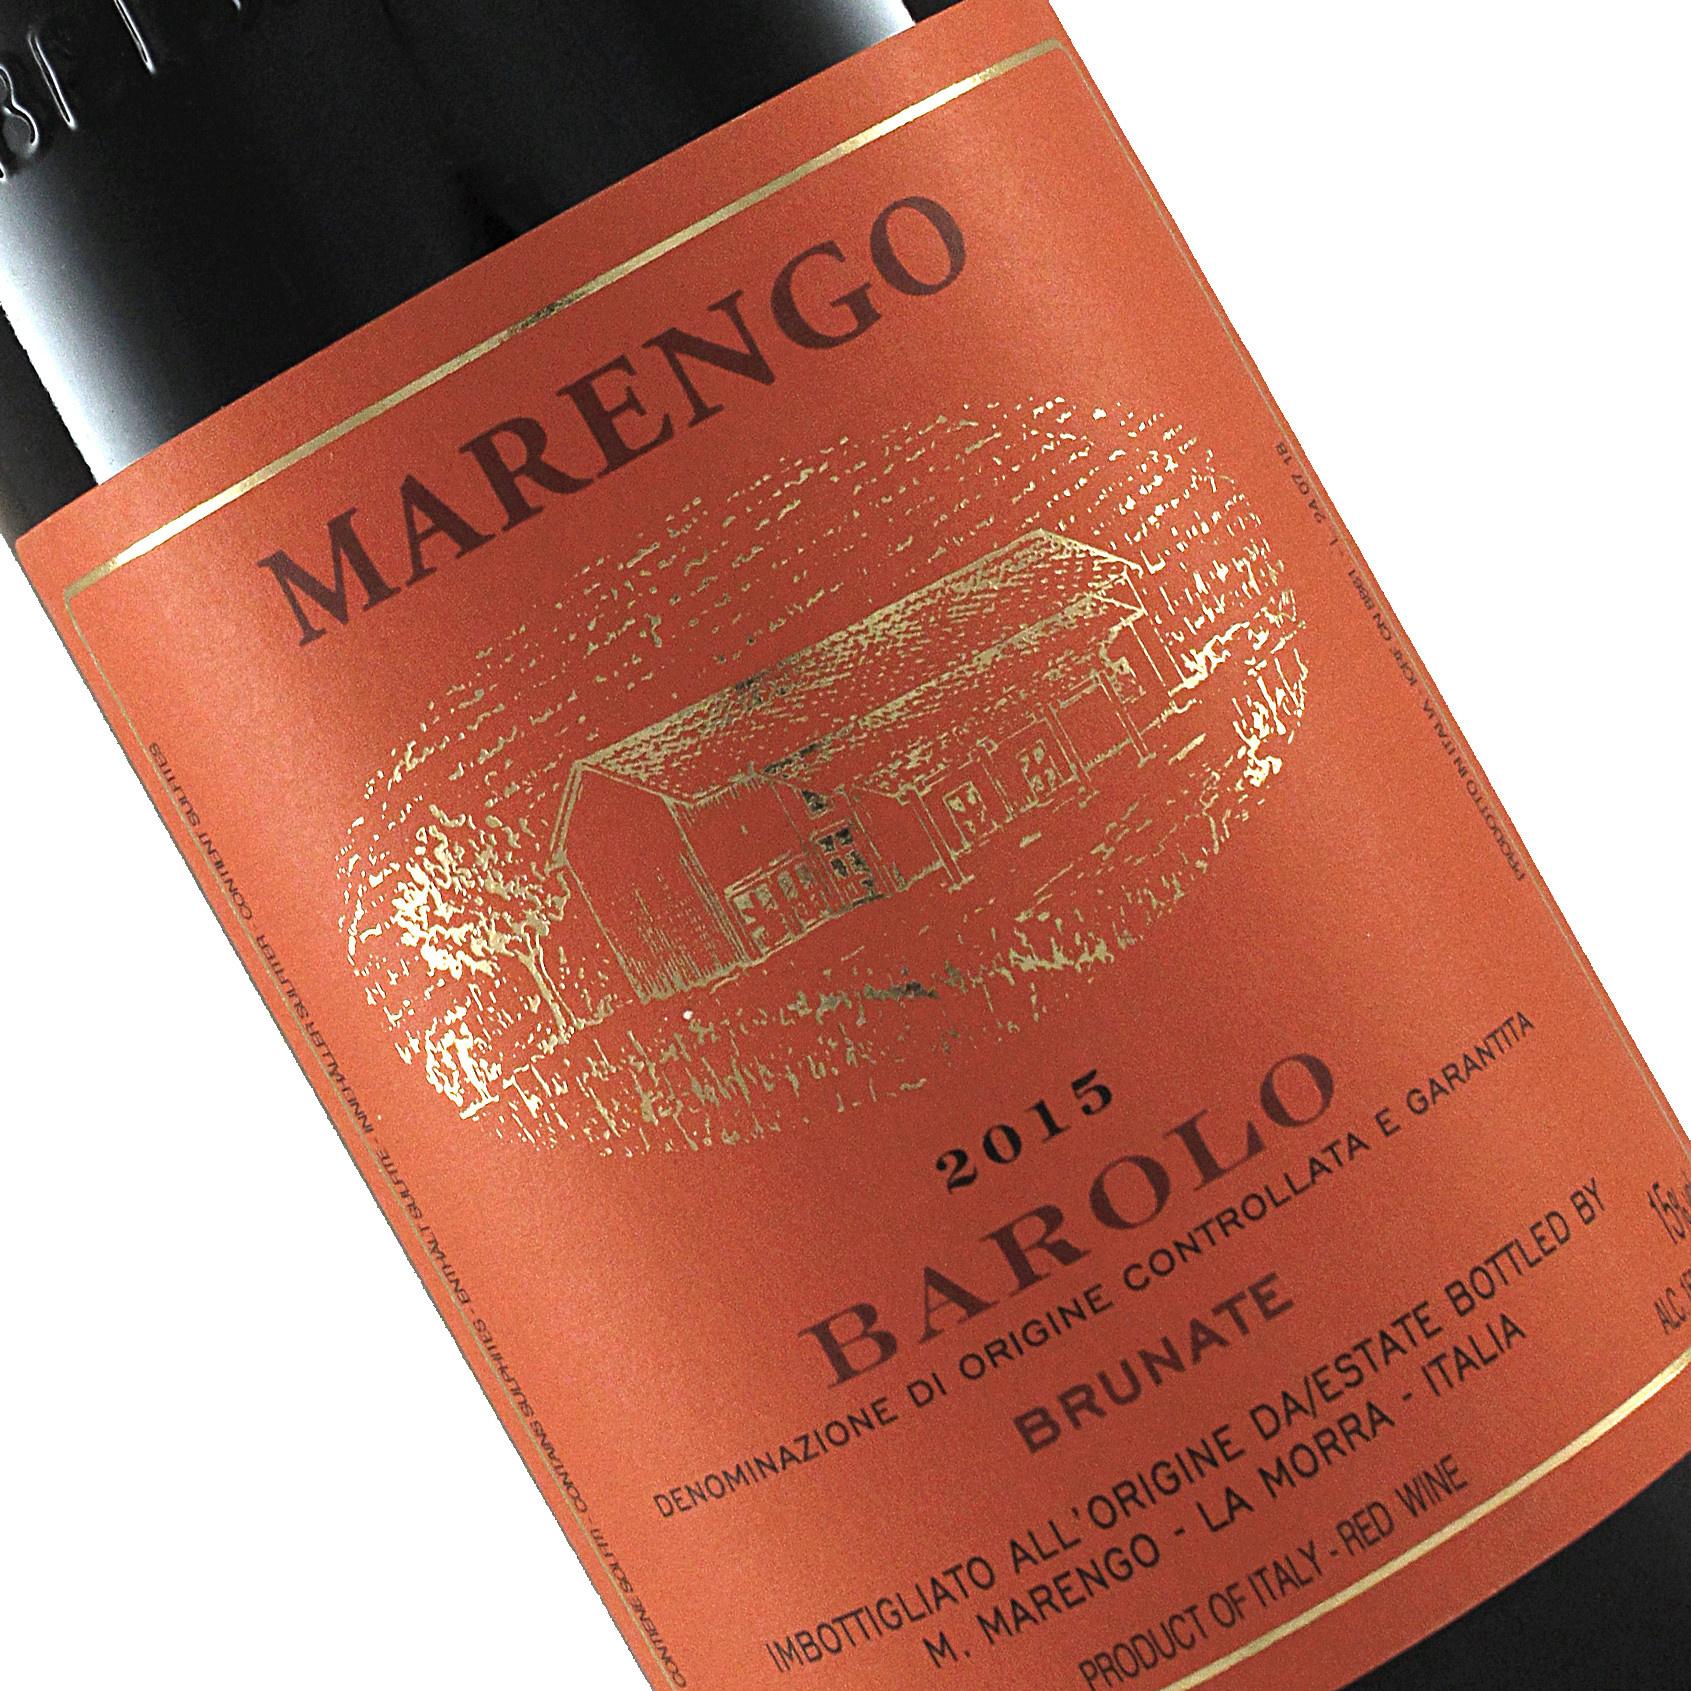 M. Marengo 2015 Barolo Brunate, Piedmont